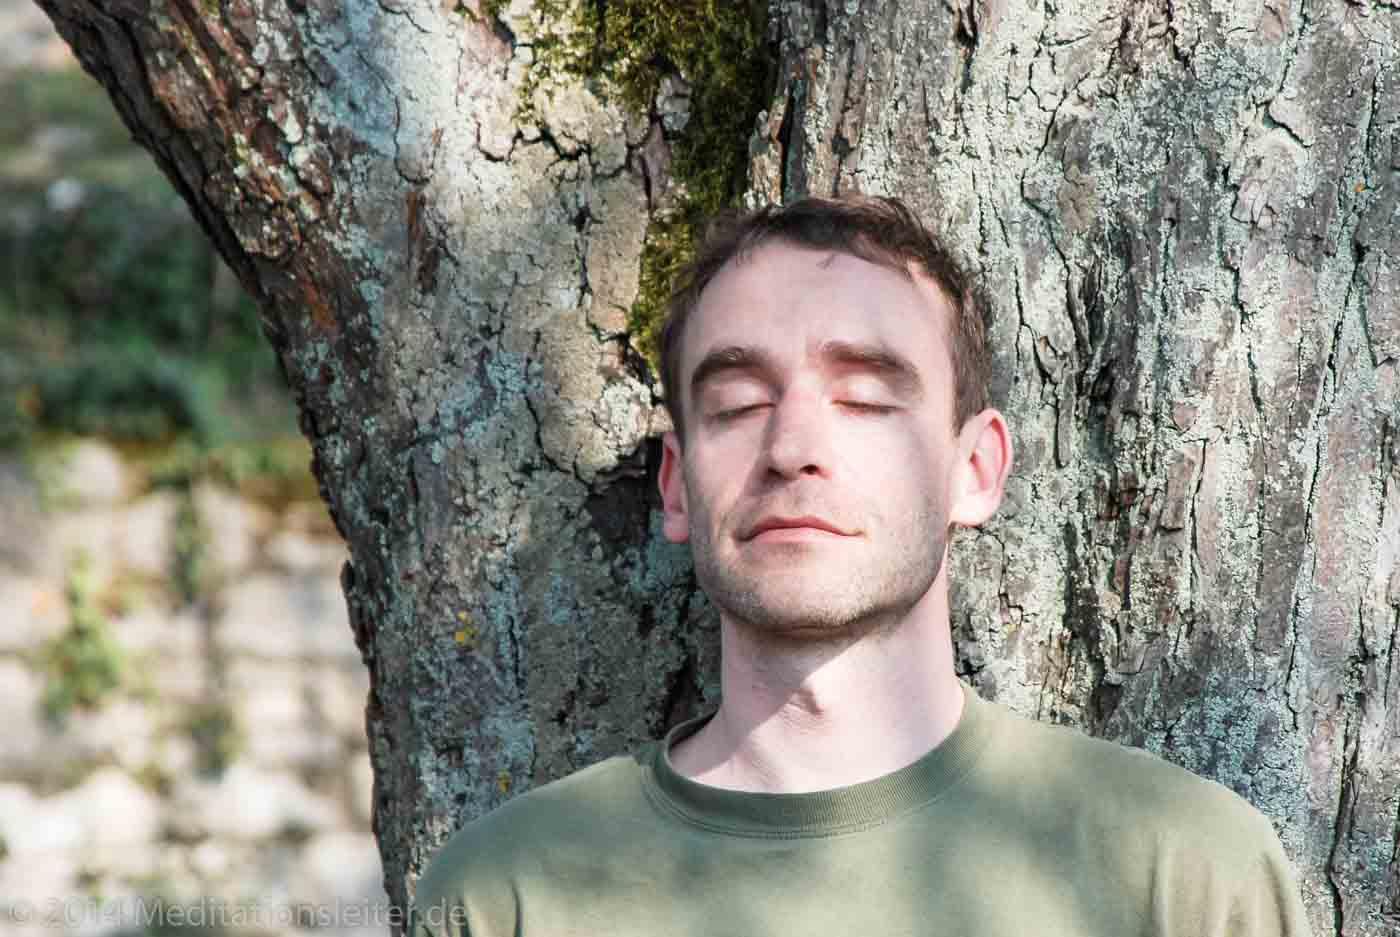 Rene Lecoutre Meditationsleiter Meditationslehrer Meditation meditieren